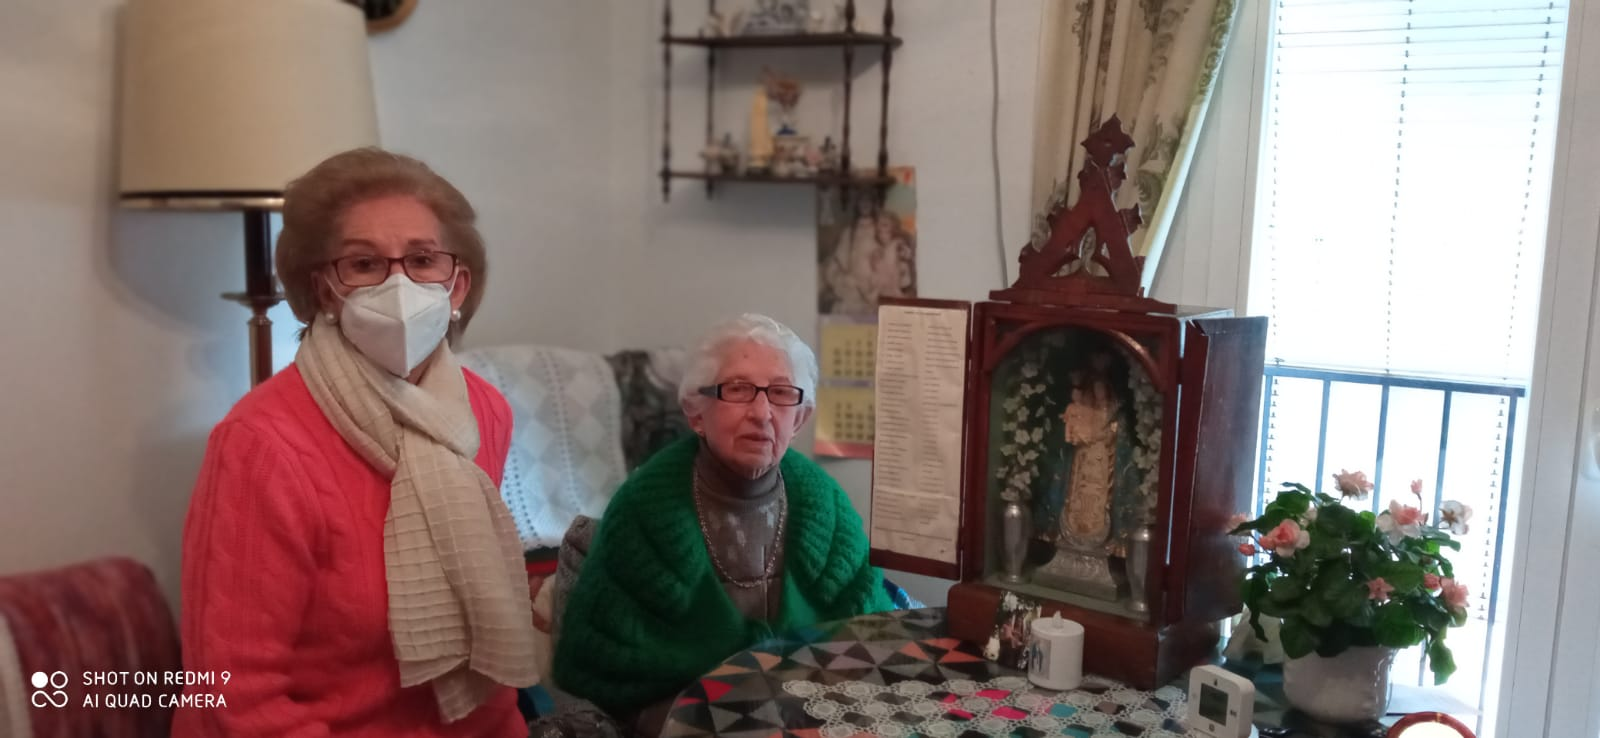 Recuperan la 'capilla portátil' centenaria desaparecida en Montefrío